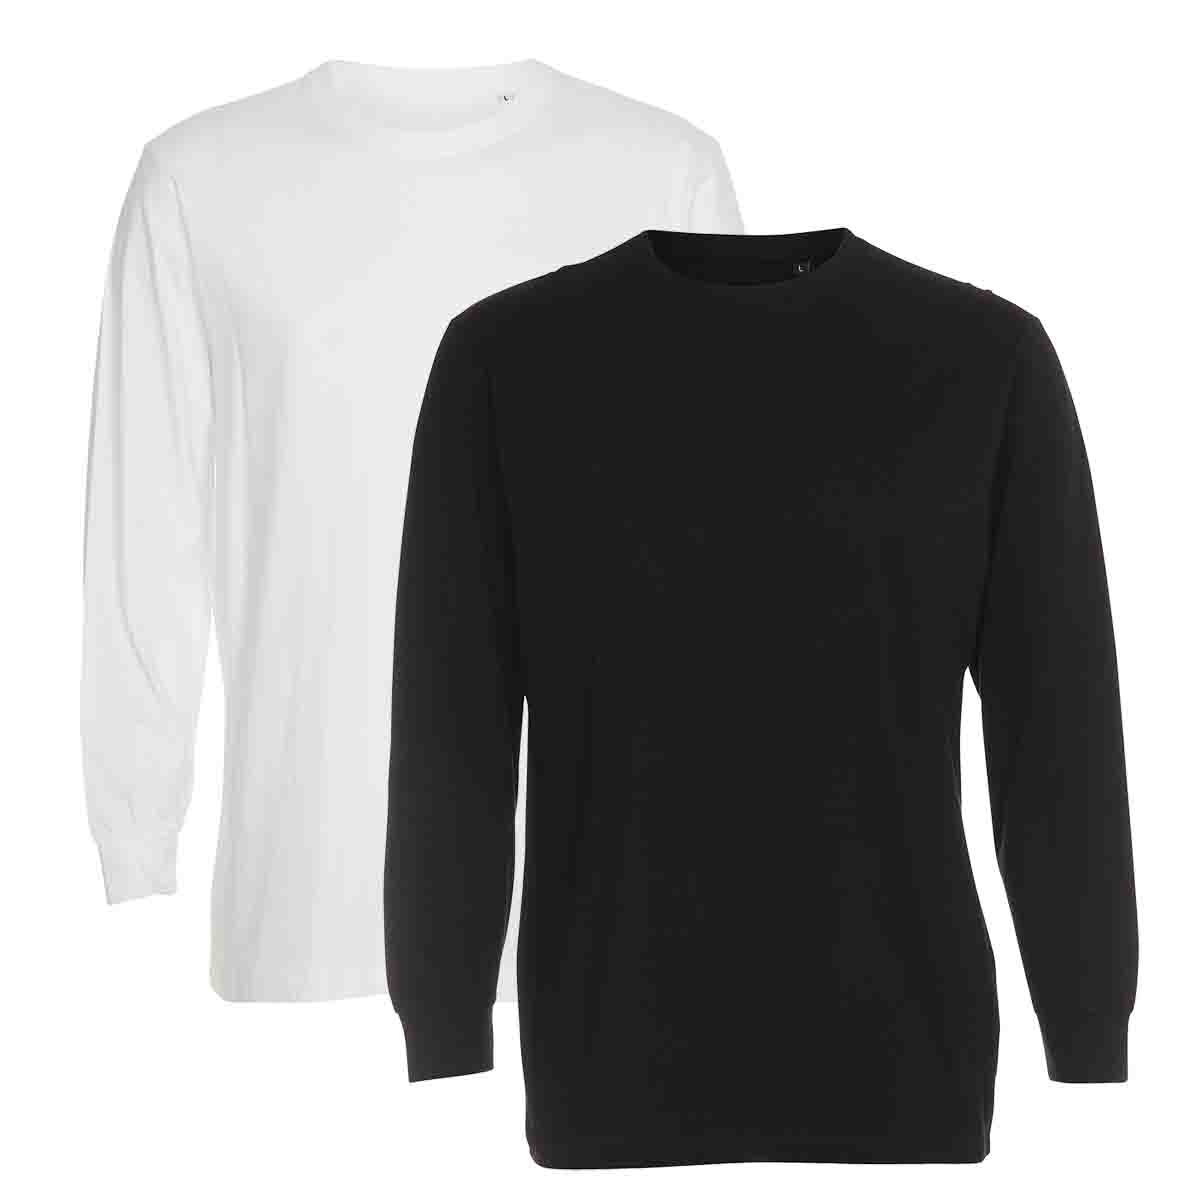 T-shirt model 120